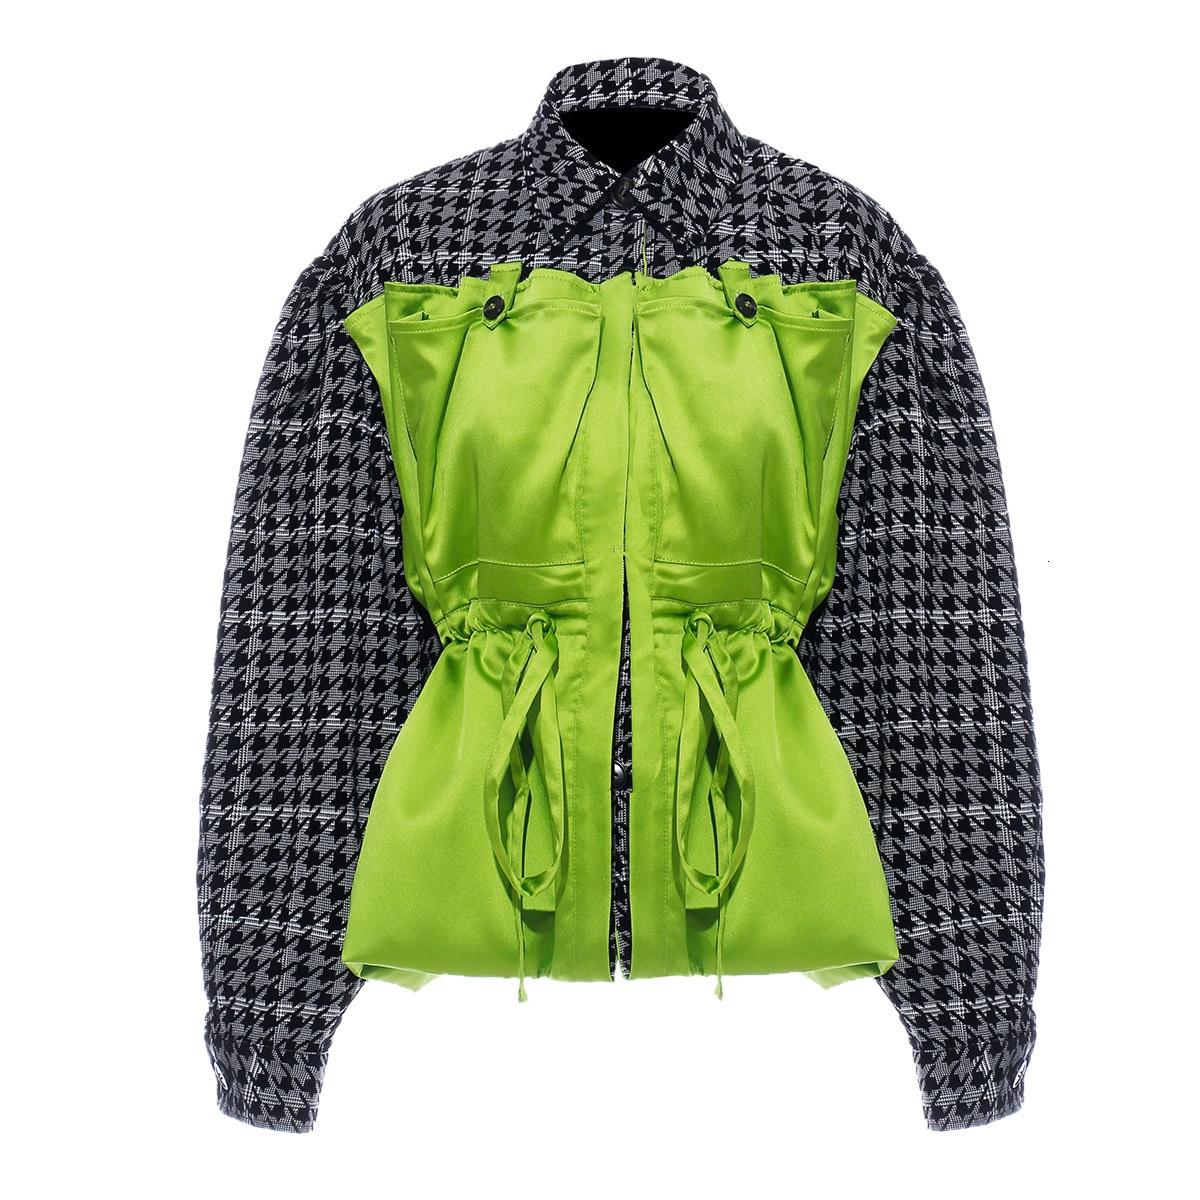 [EAM] Loose Fit Plaid Drawstring Split Big Size Jacket New Lapel Long Sleeve Women Coat Fashion Tide Spring Autumn 2020 1H203 7